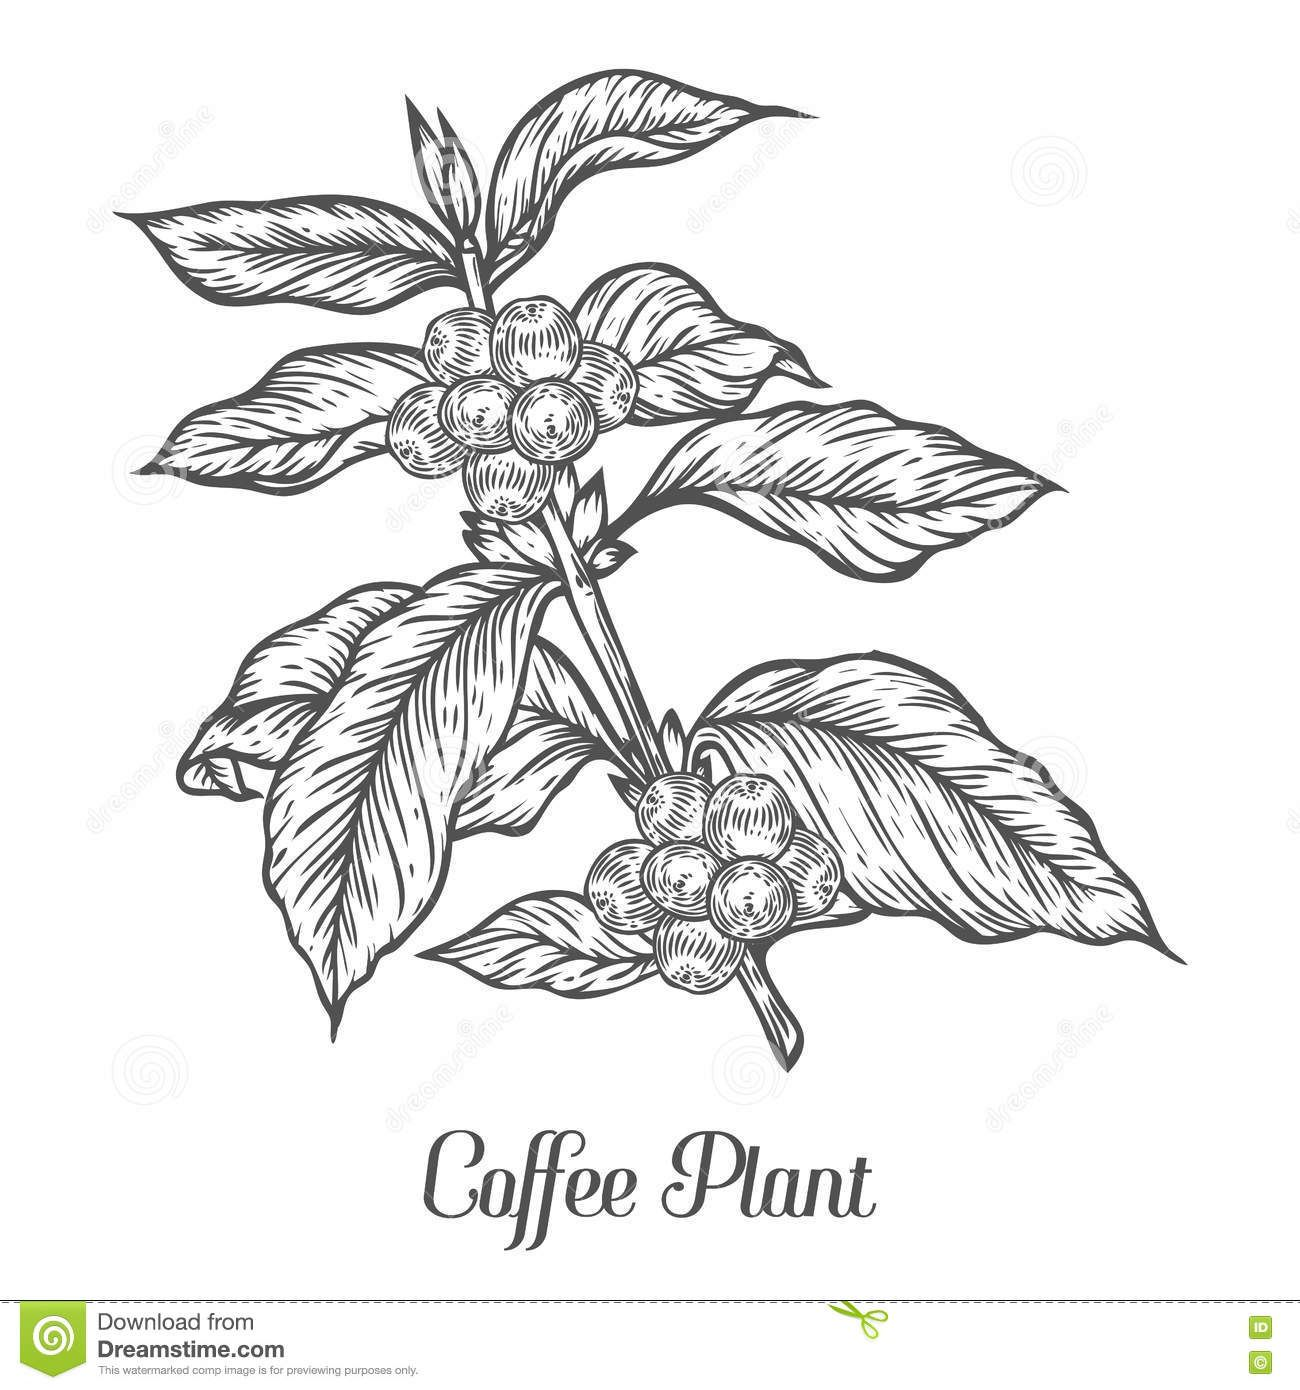 Pin by Sabirsamir on Café Coffee plant, Coffee beans